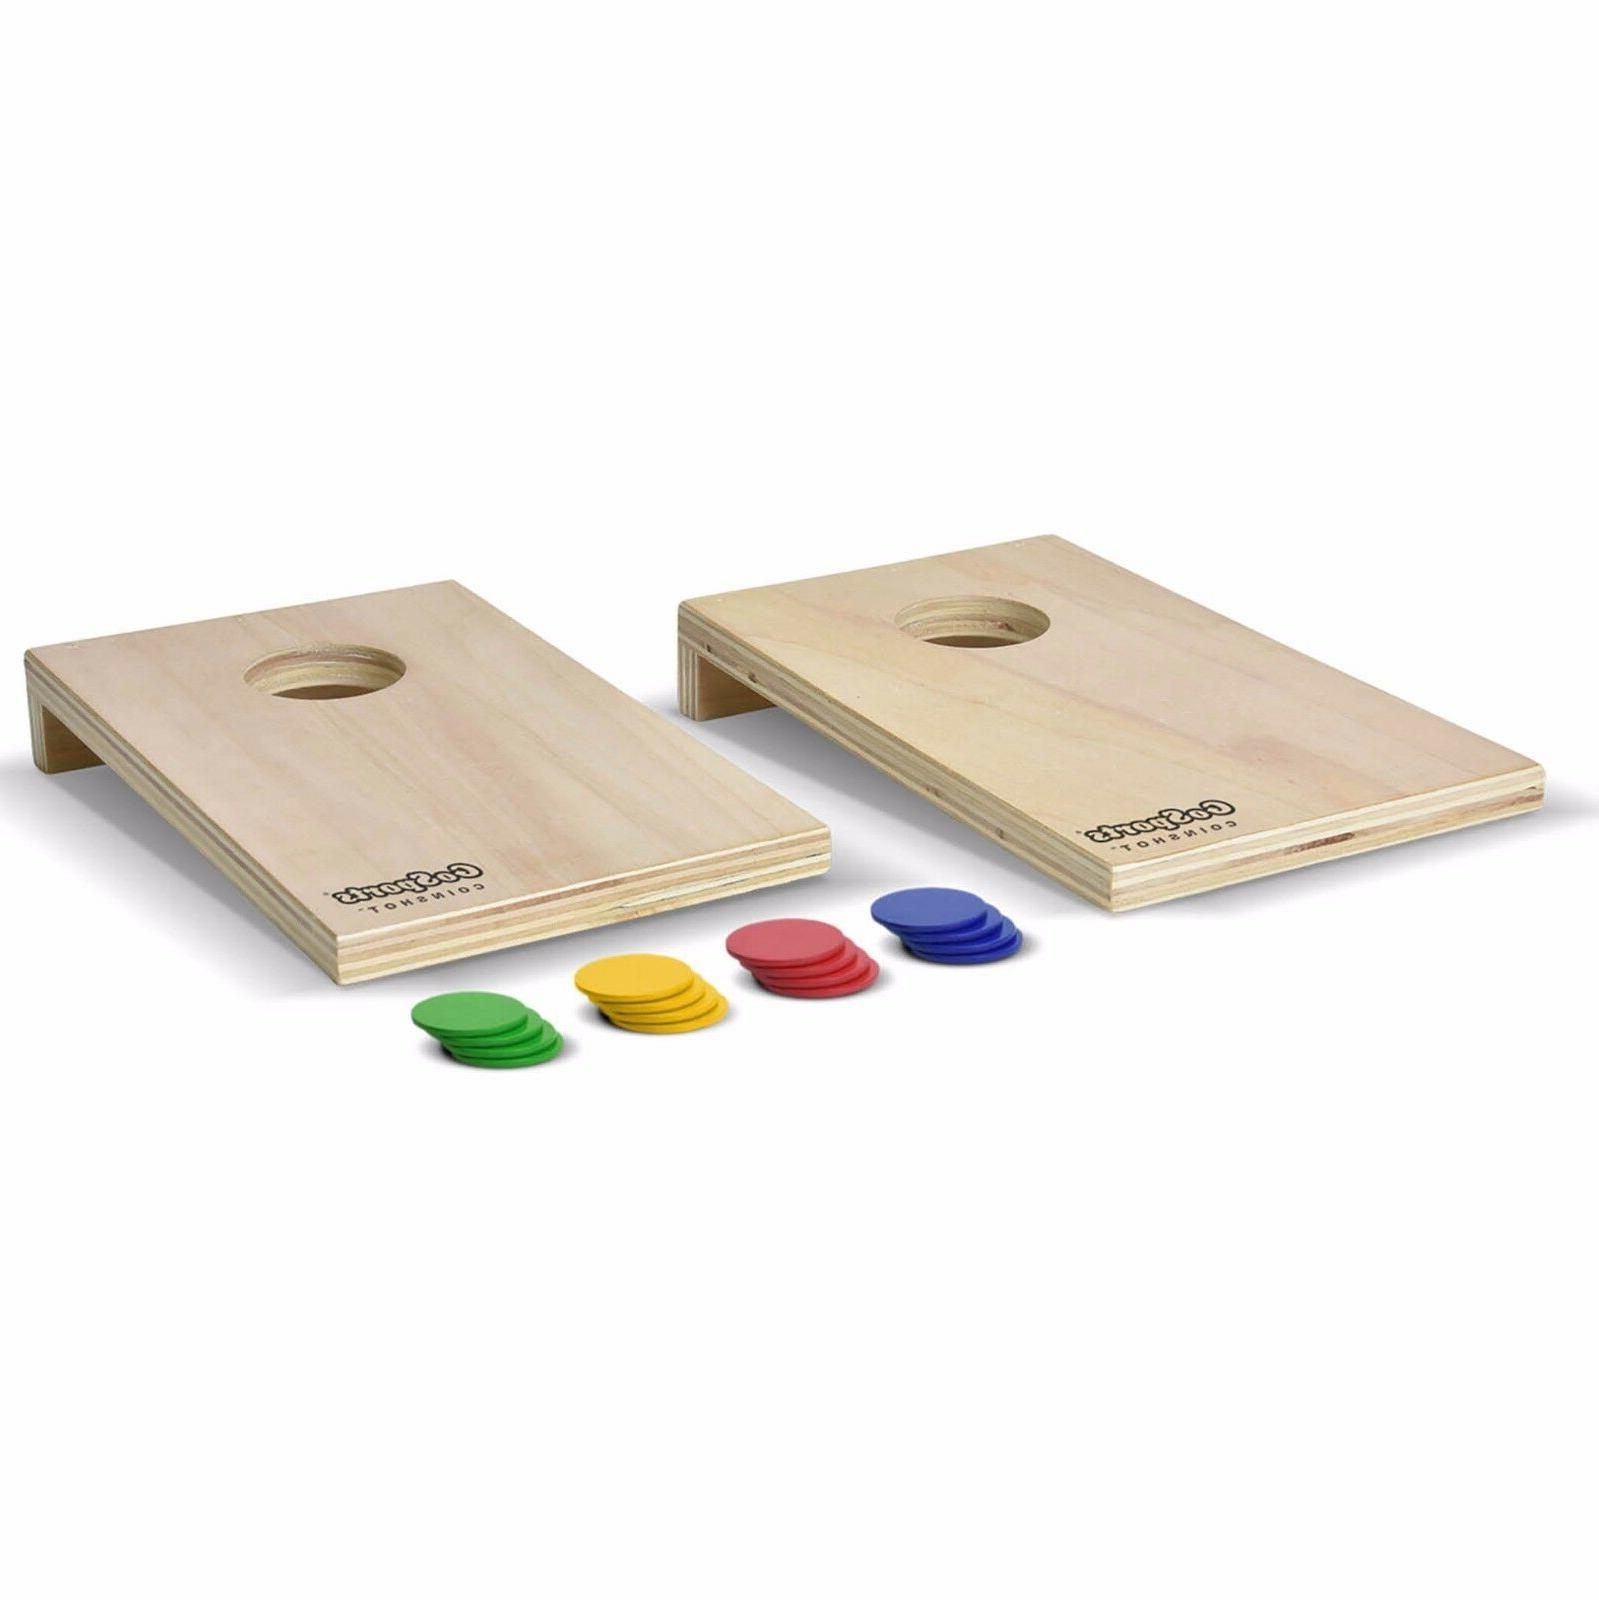 coinshot mini cornhole game set